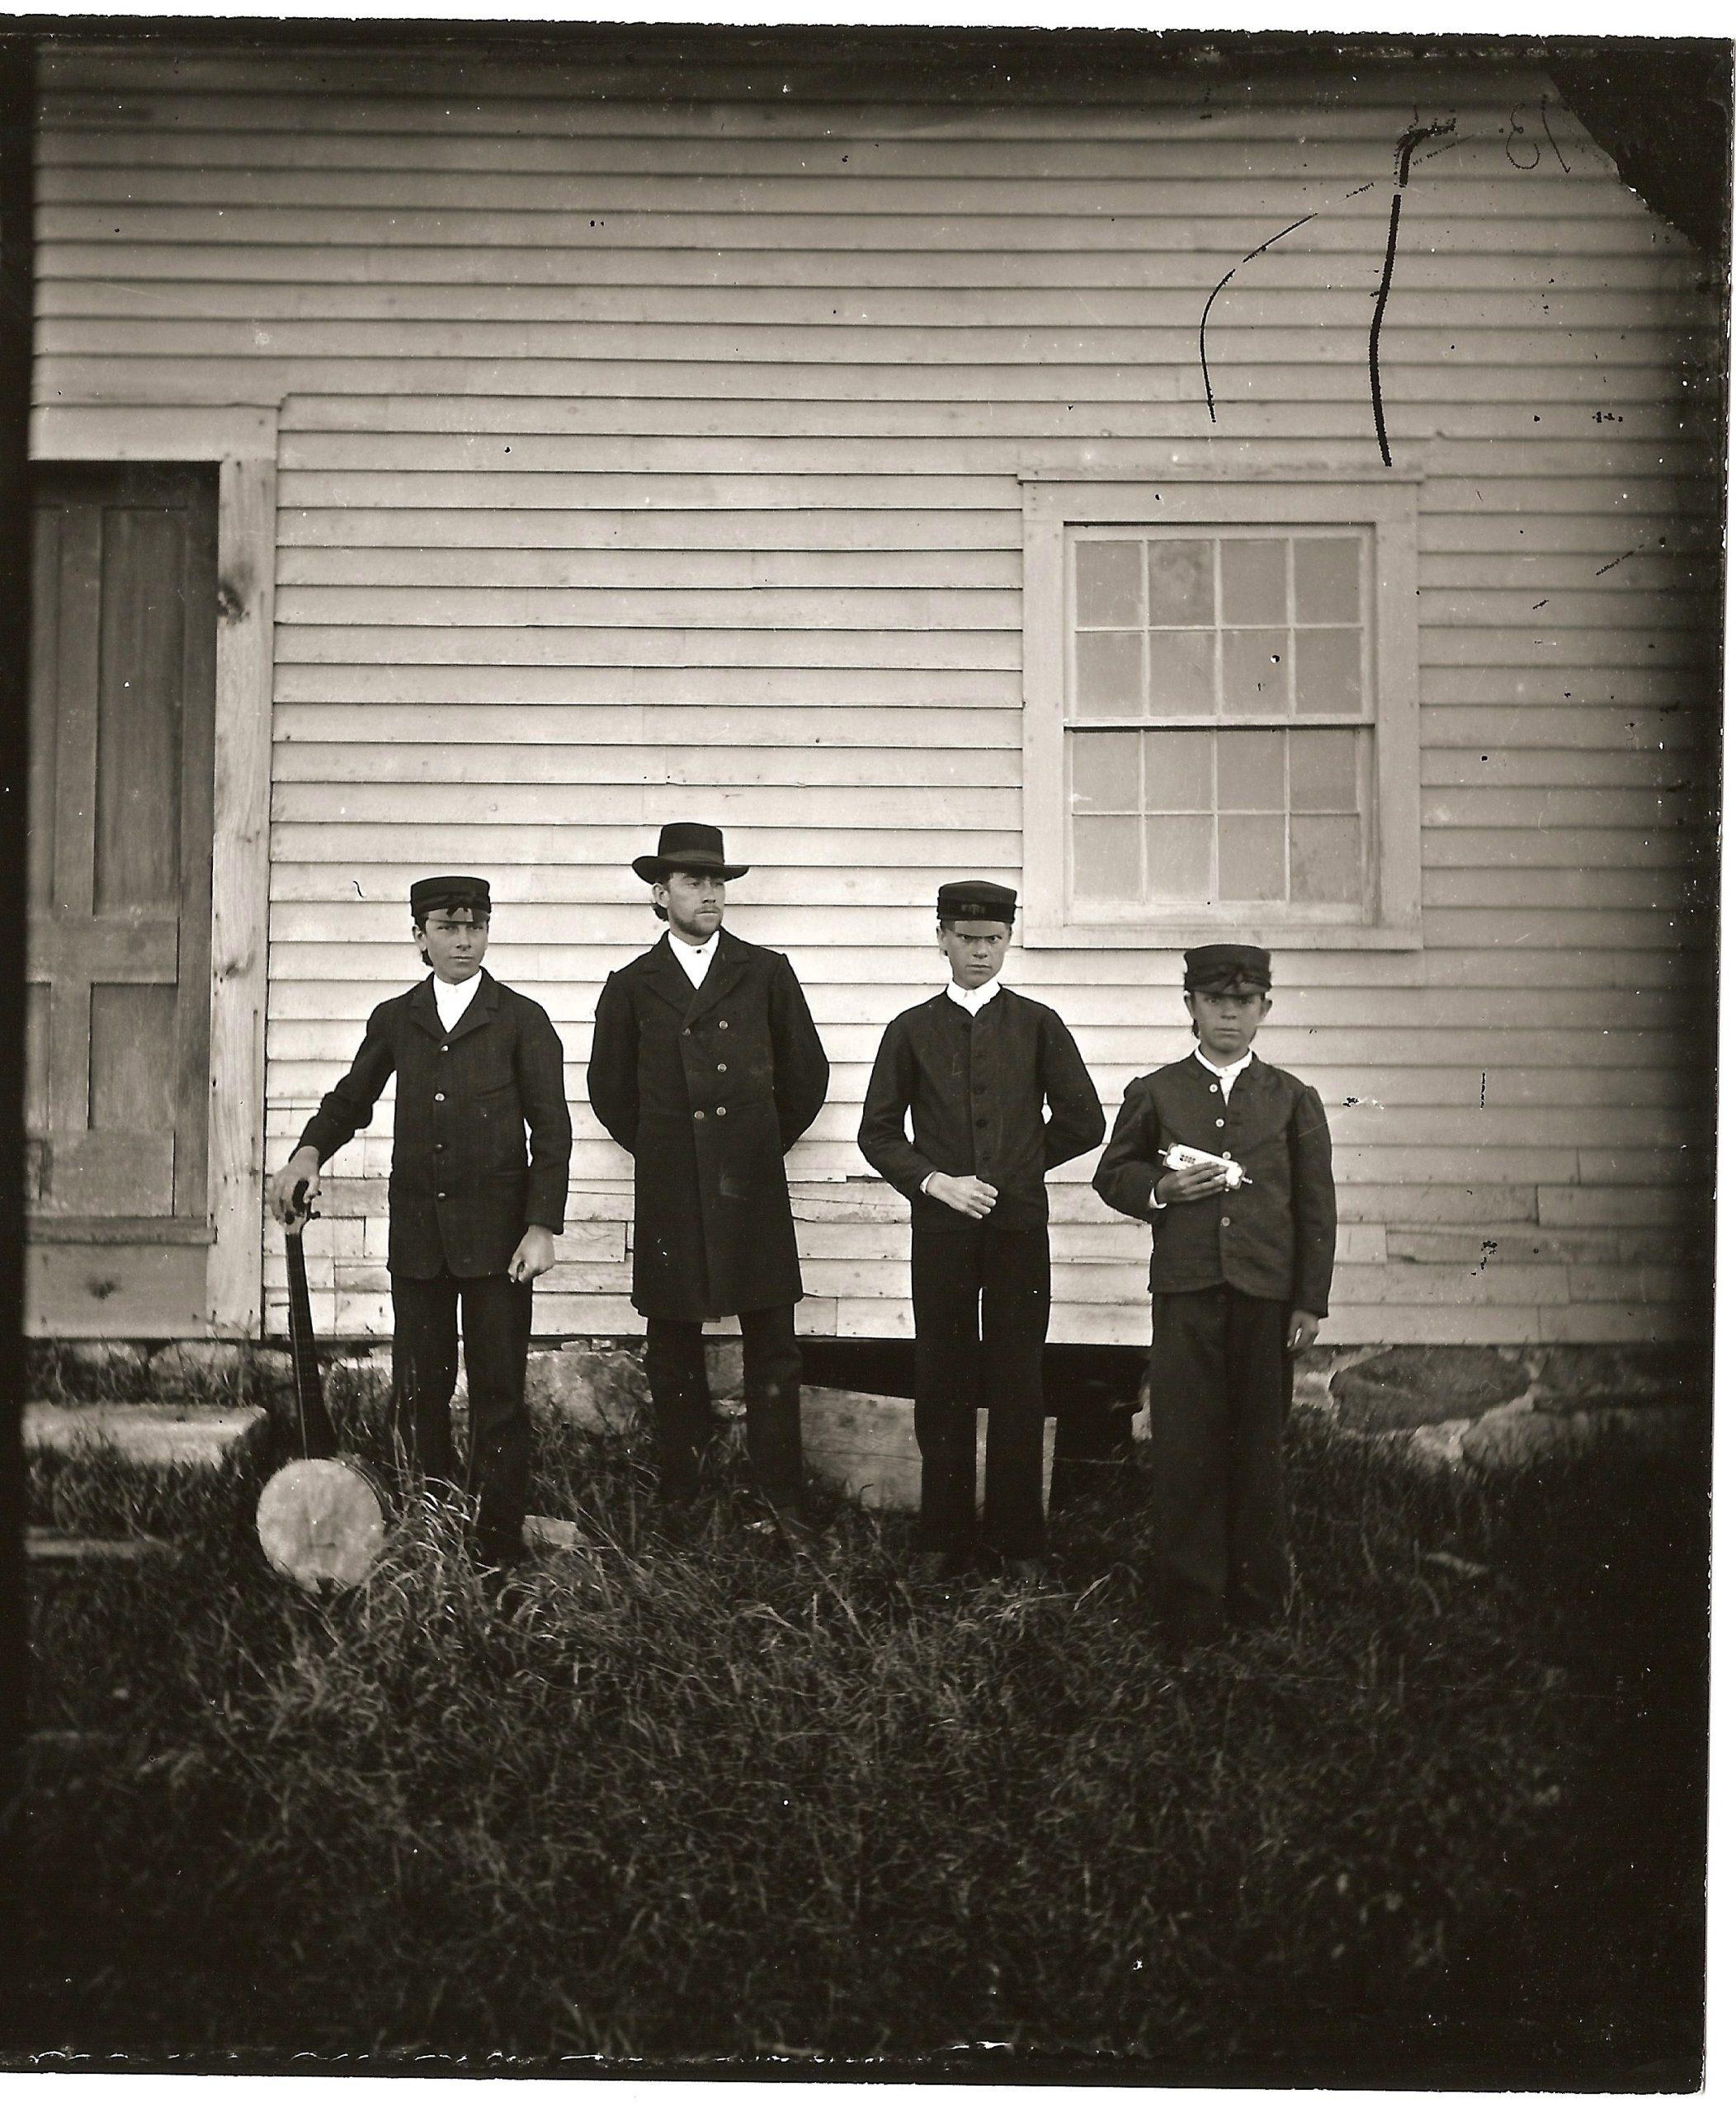 Enfield Shaker Boys at South Family